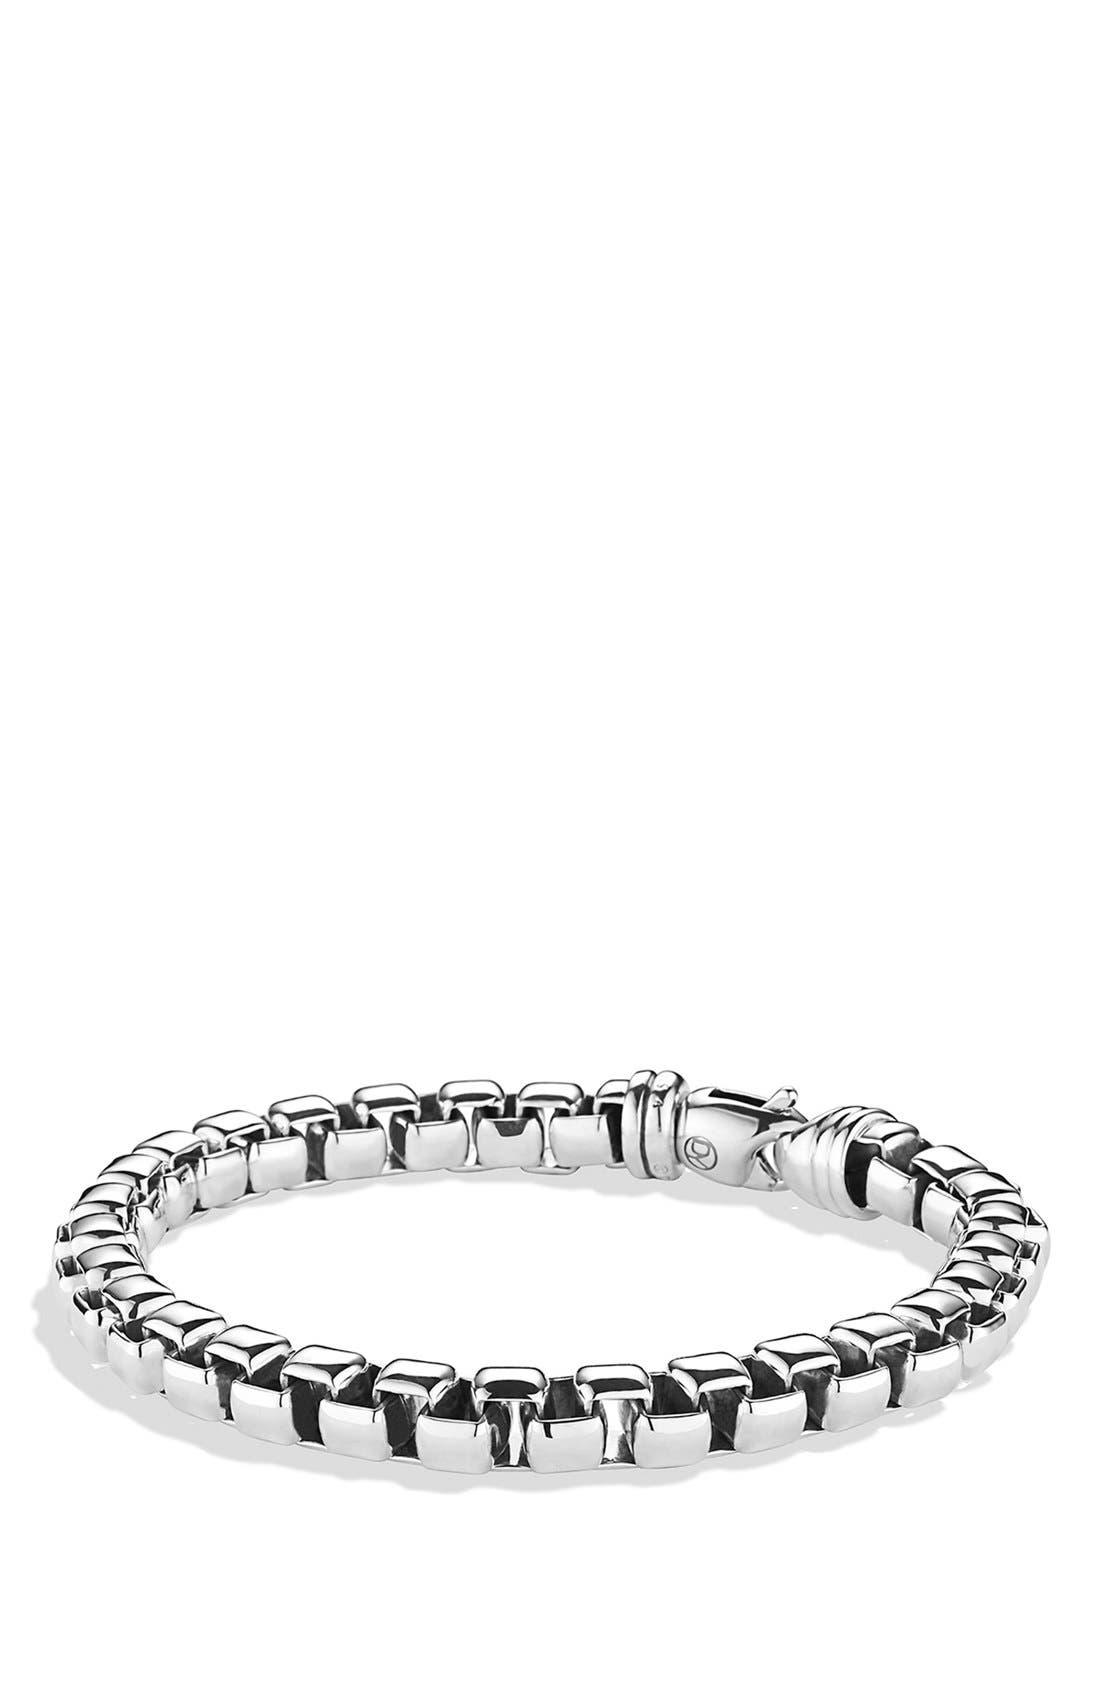 david yurman extralarge box chain bracelet